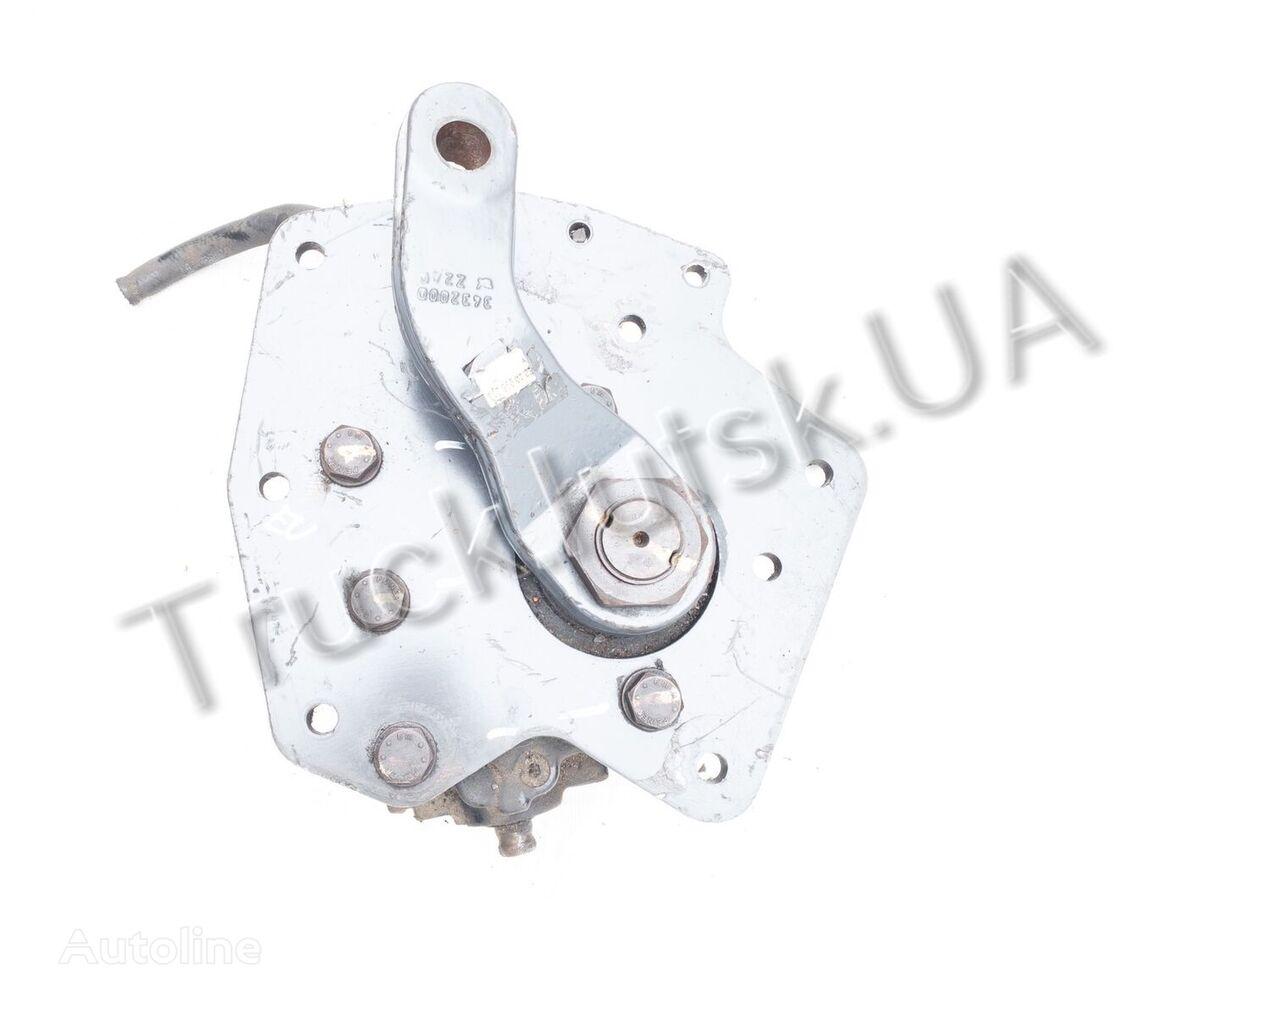 RENAULT (5010095239) steering column for RENAULT MAGNUM tractor unit